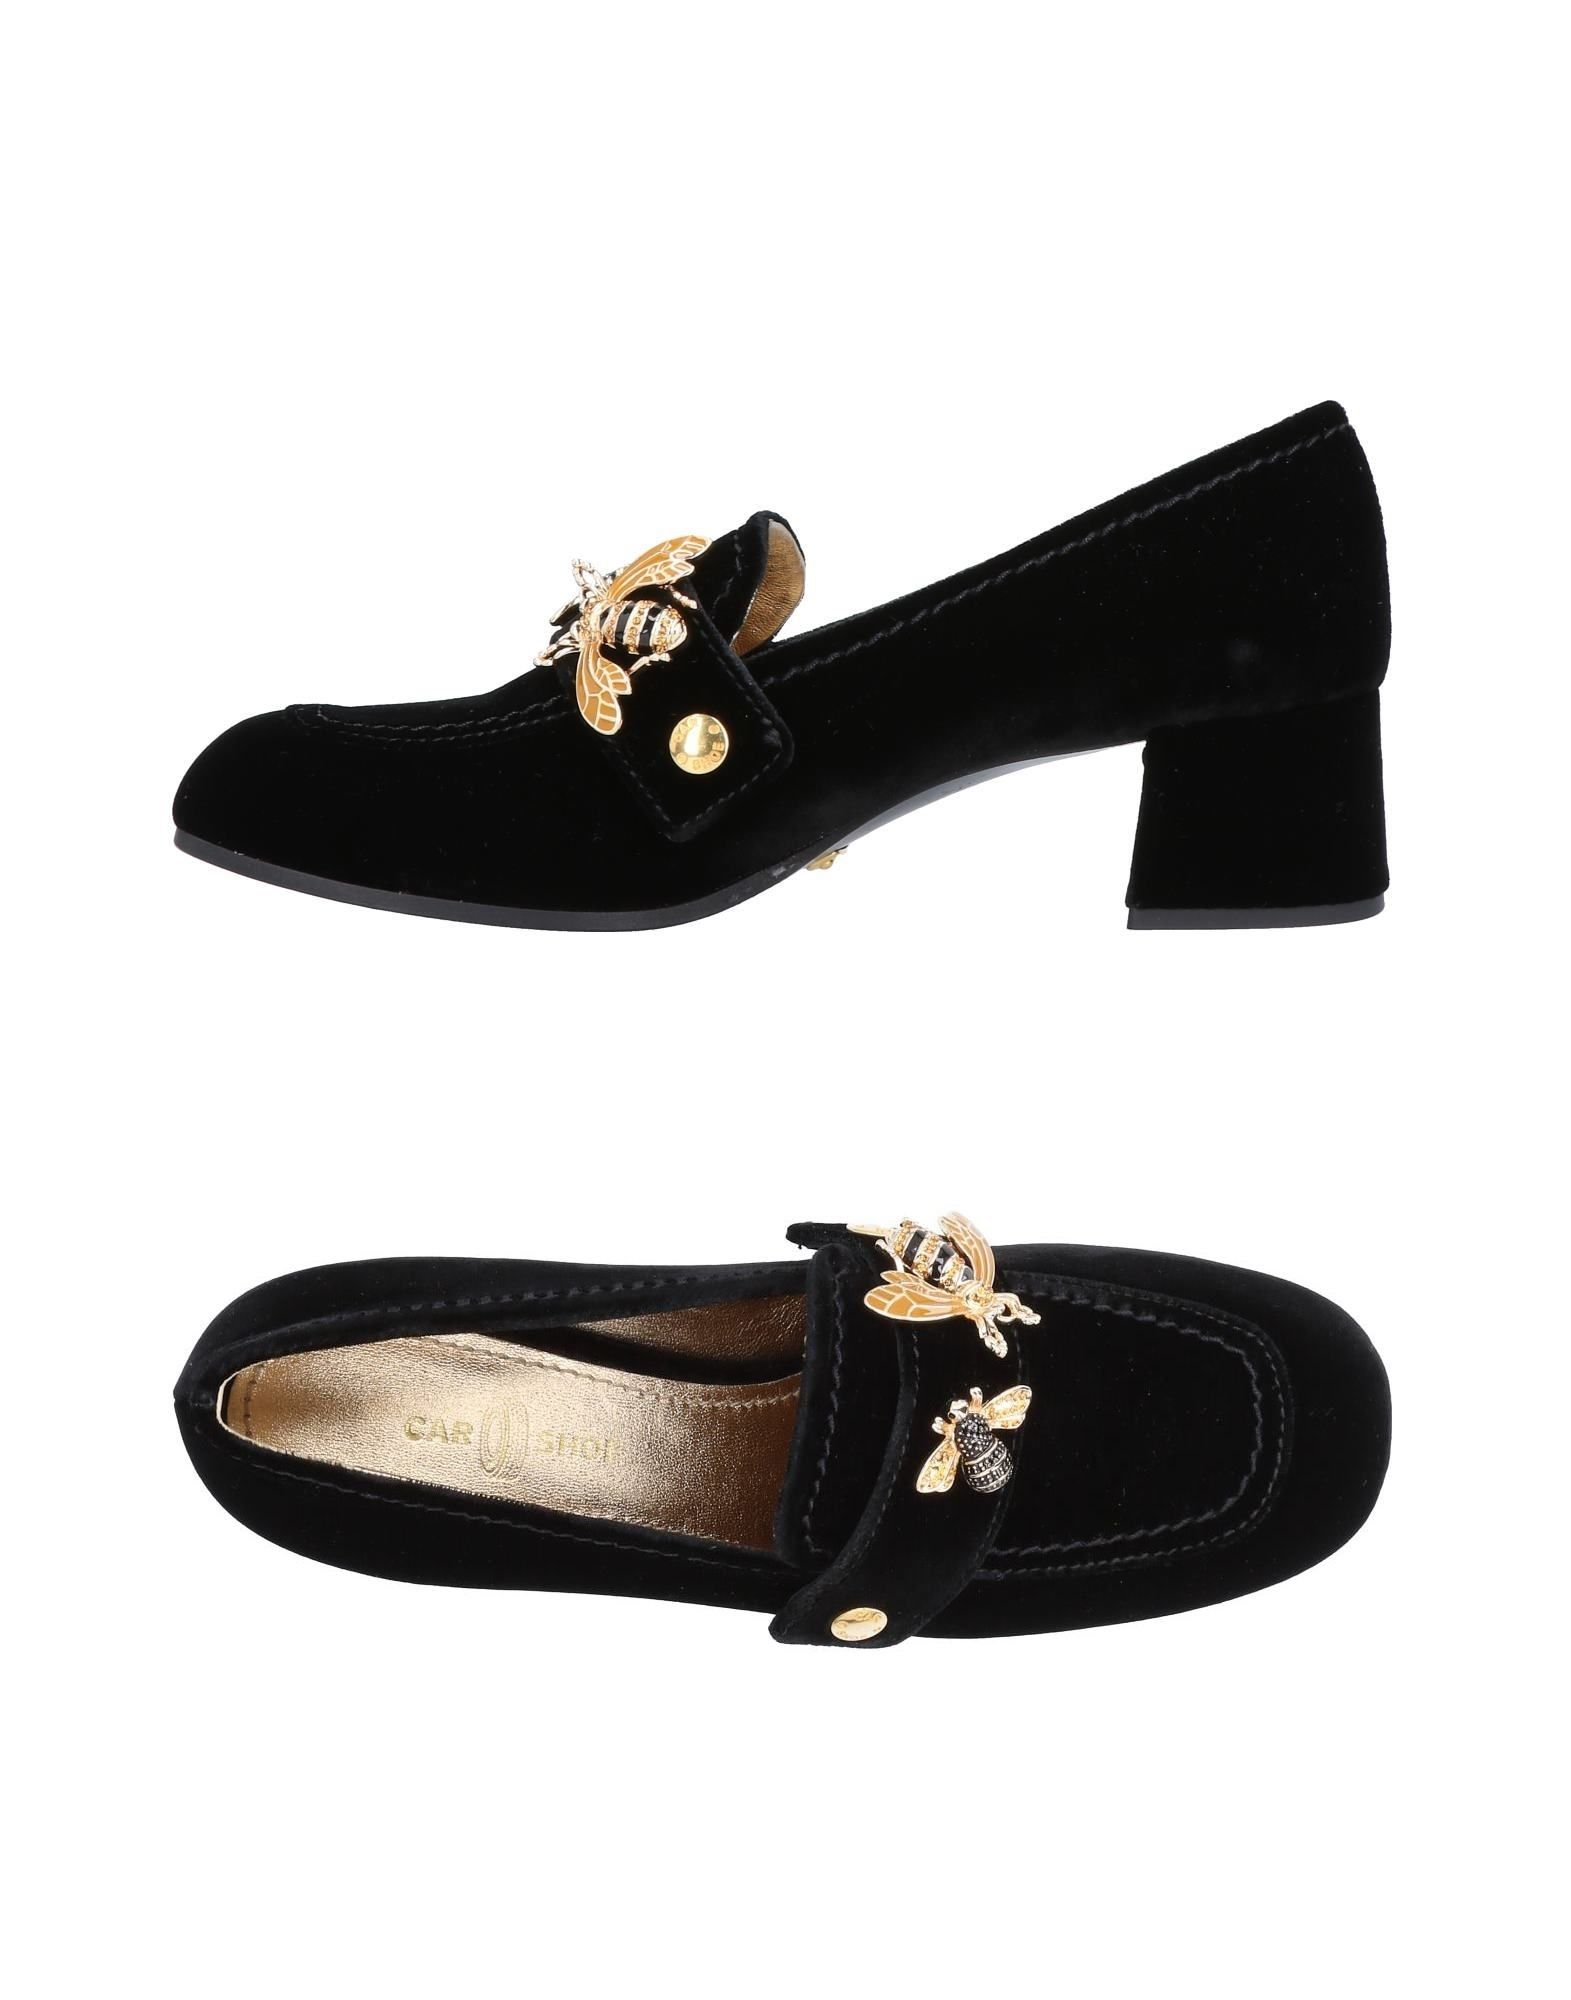 Haltbare Mode billige Schuhe Carshoe Mokassins Damen  11503484WA Heiße Schuhe